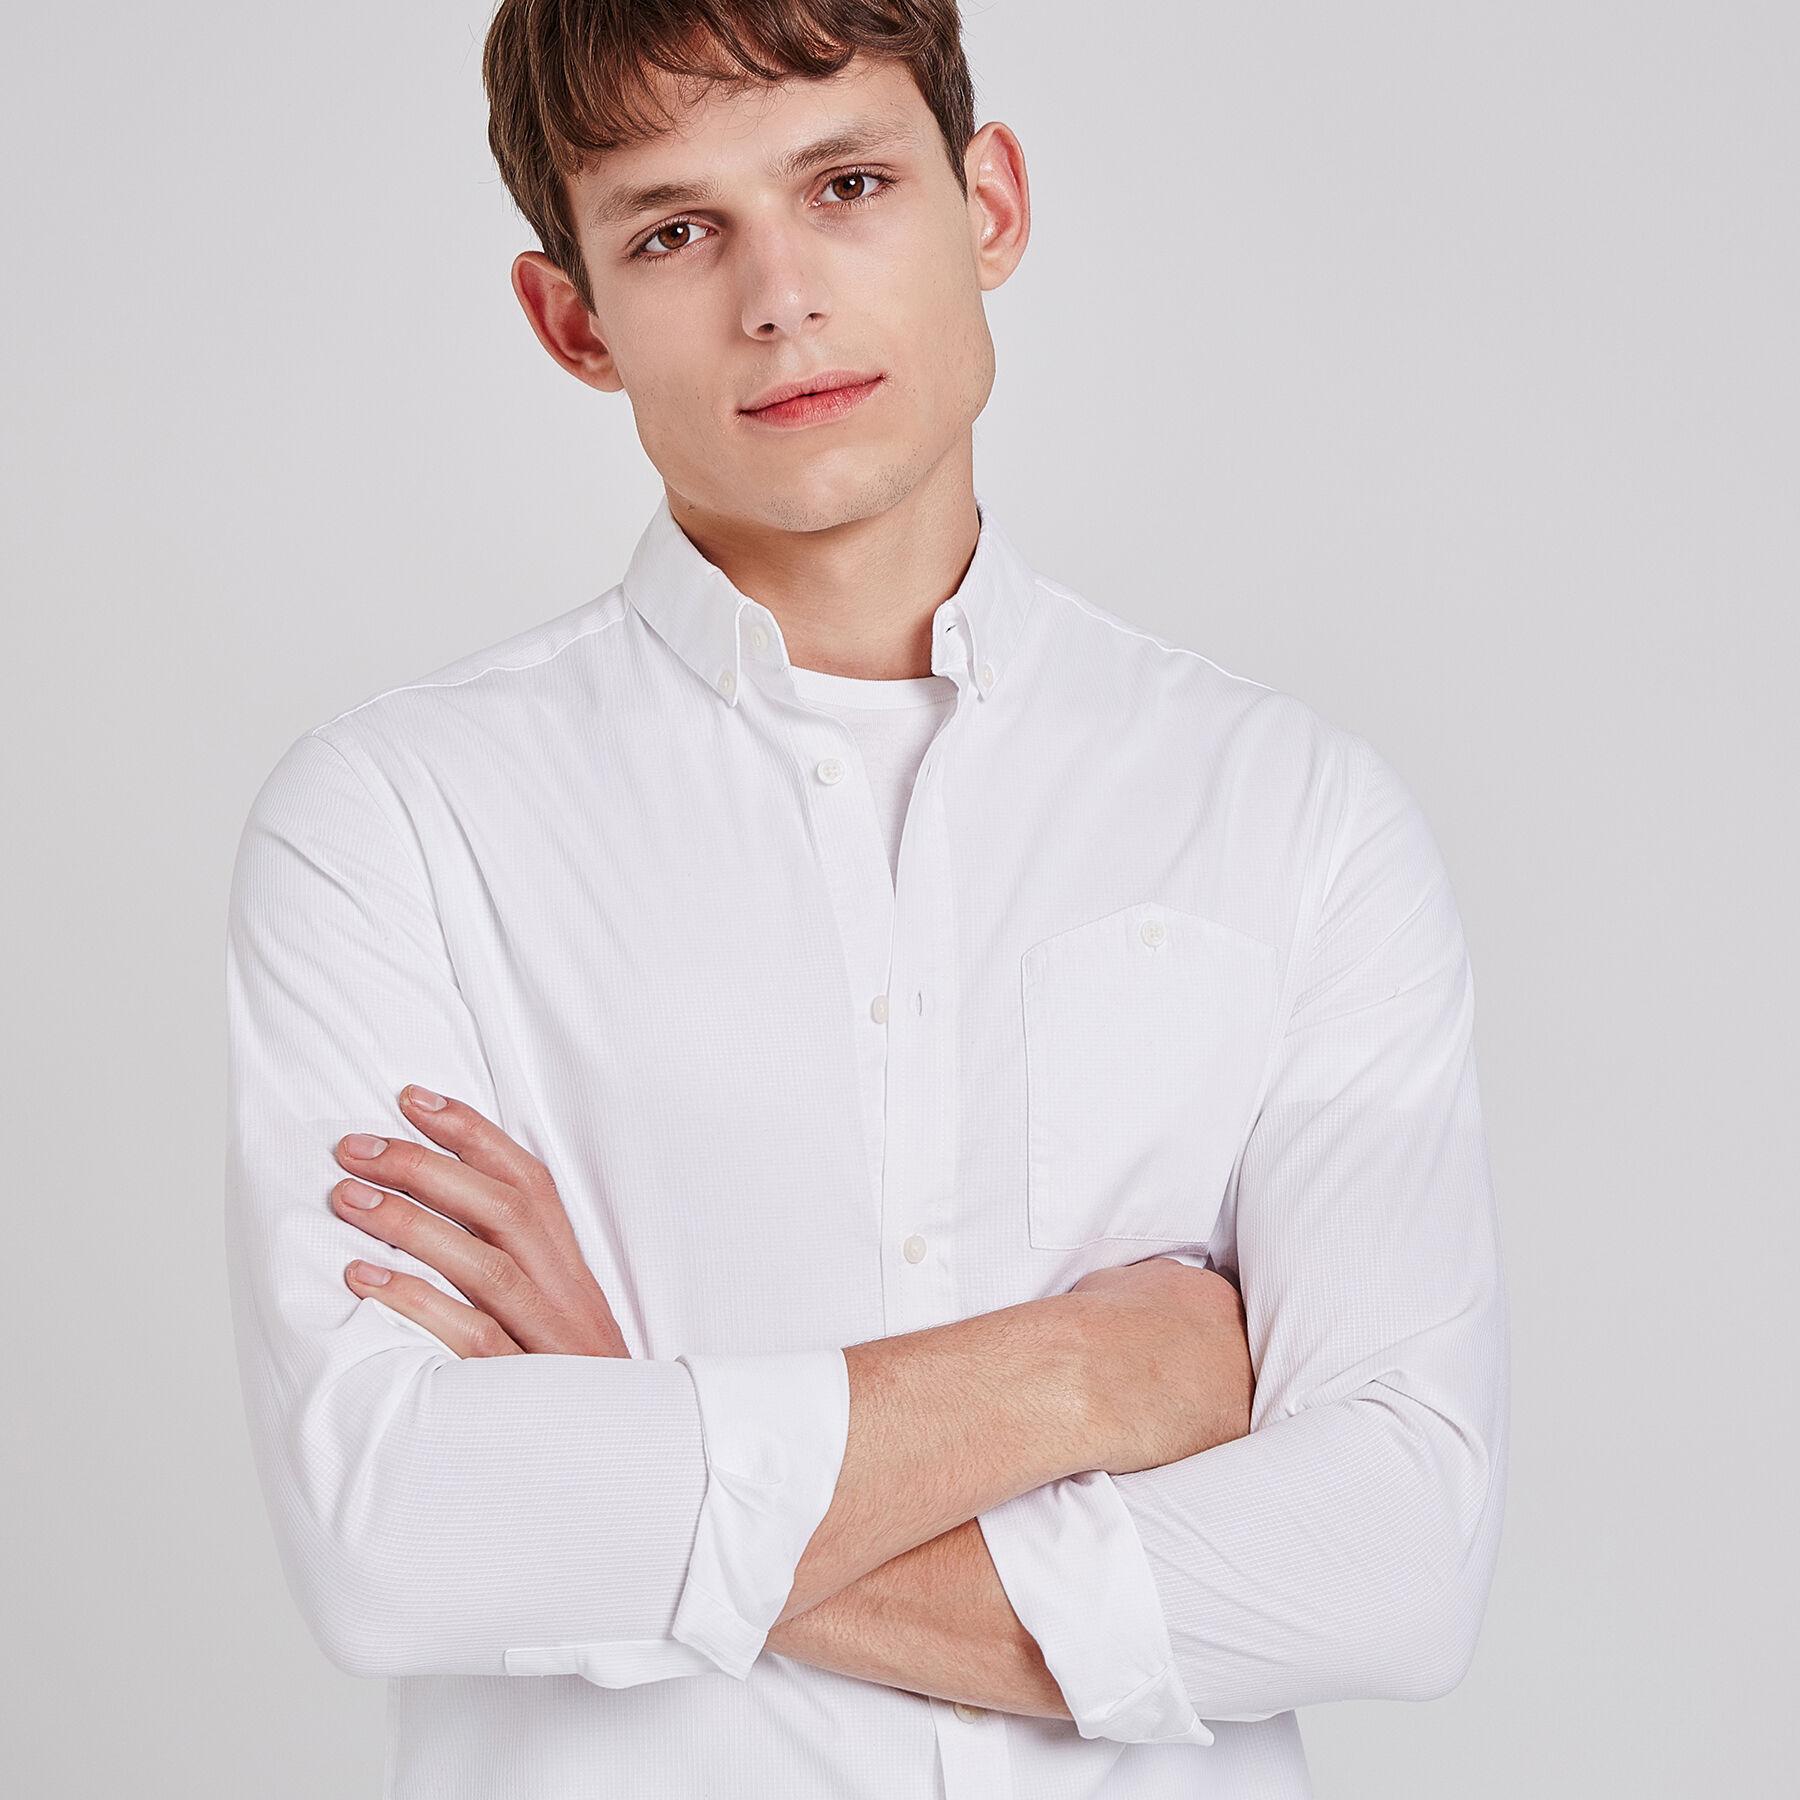 b9c6b791227 Geborduurd hemd, regular snit Wit Mannen - Jules